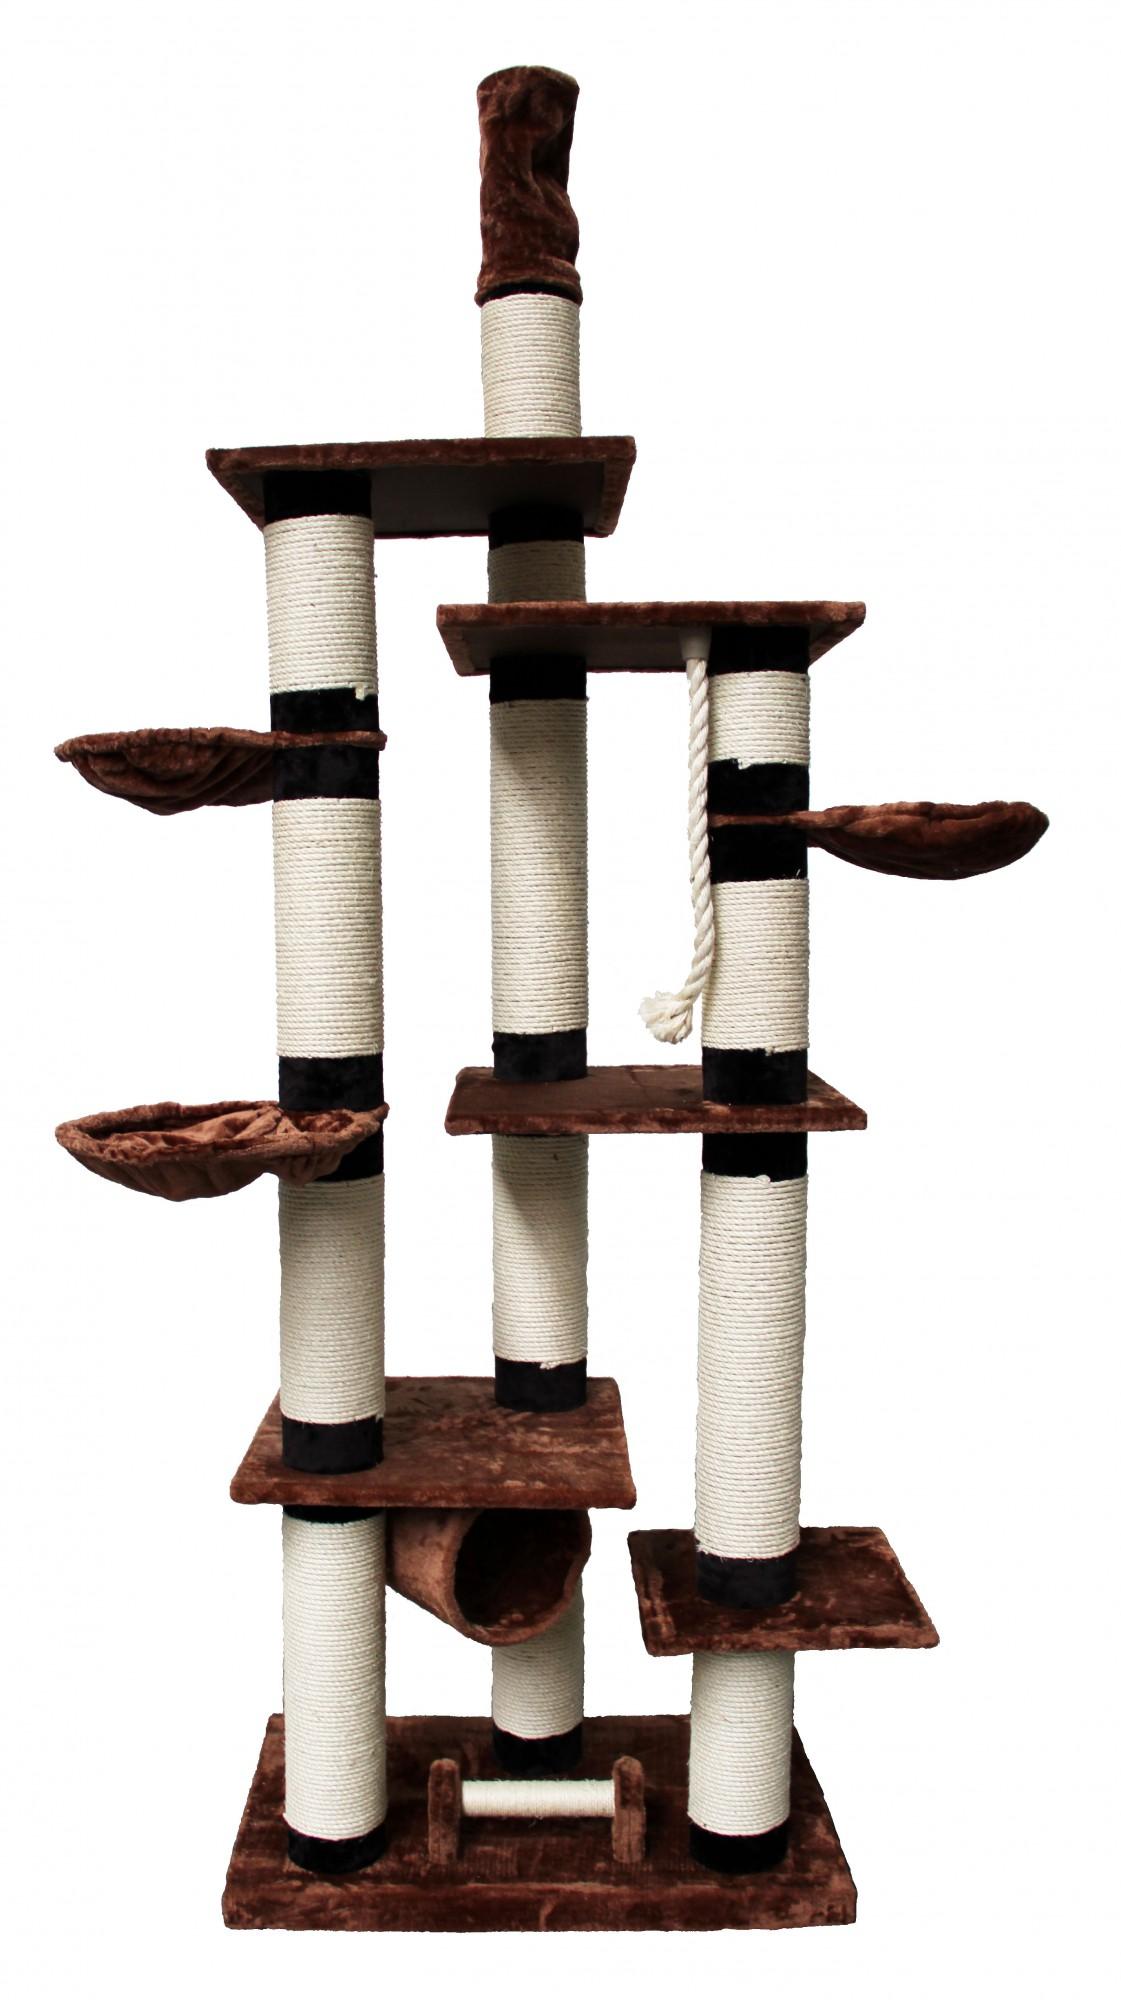 katzenbaum atlantis deckenhoch ca 14cm s ulen mit sisalseil kratzbaum katze neu ebay. Black Bedroom Furniture Sets. Home Design Ideas